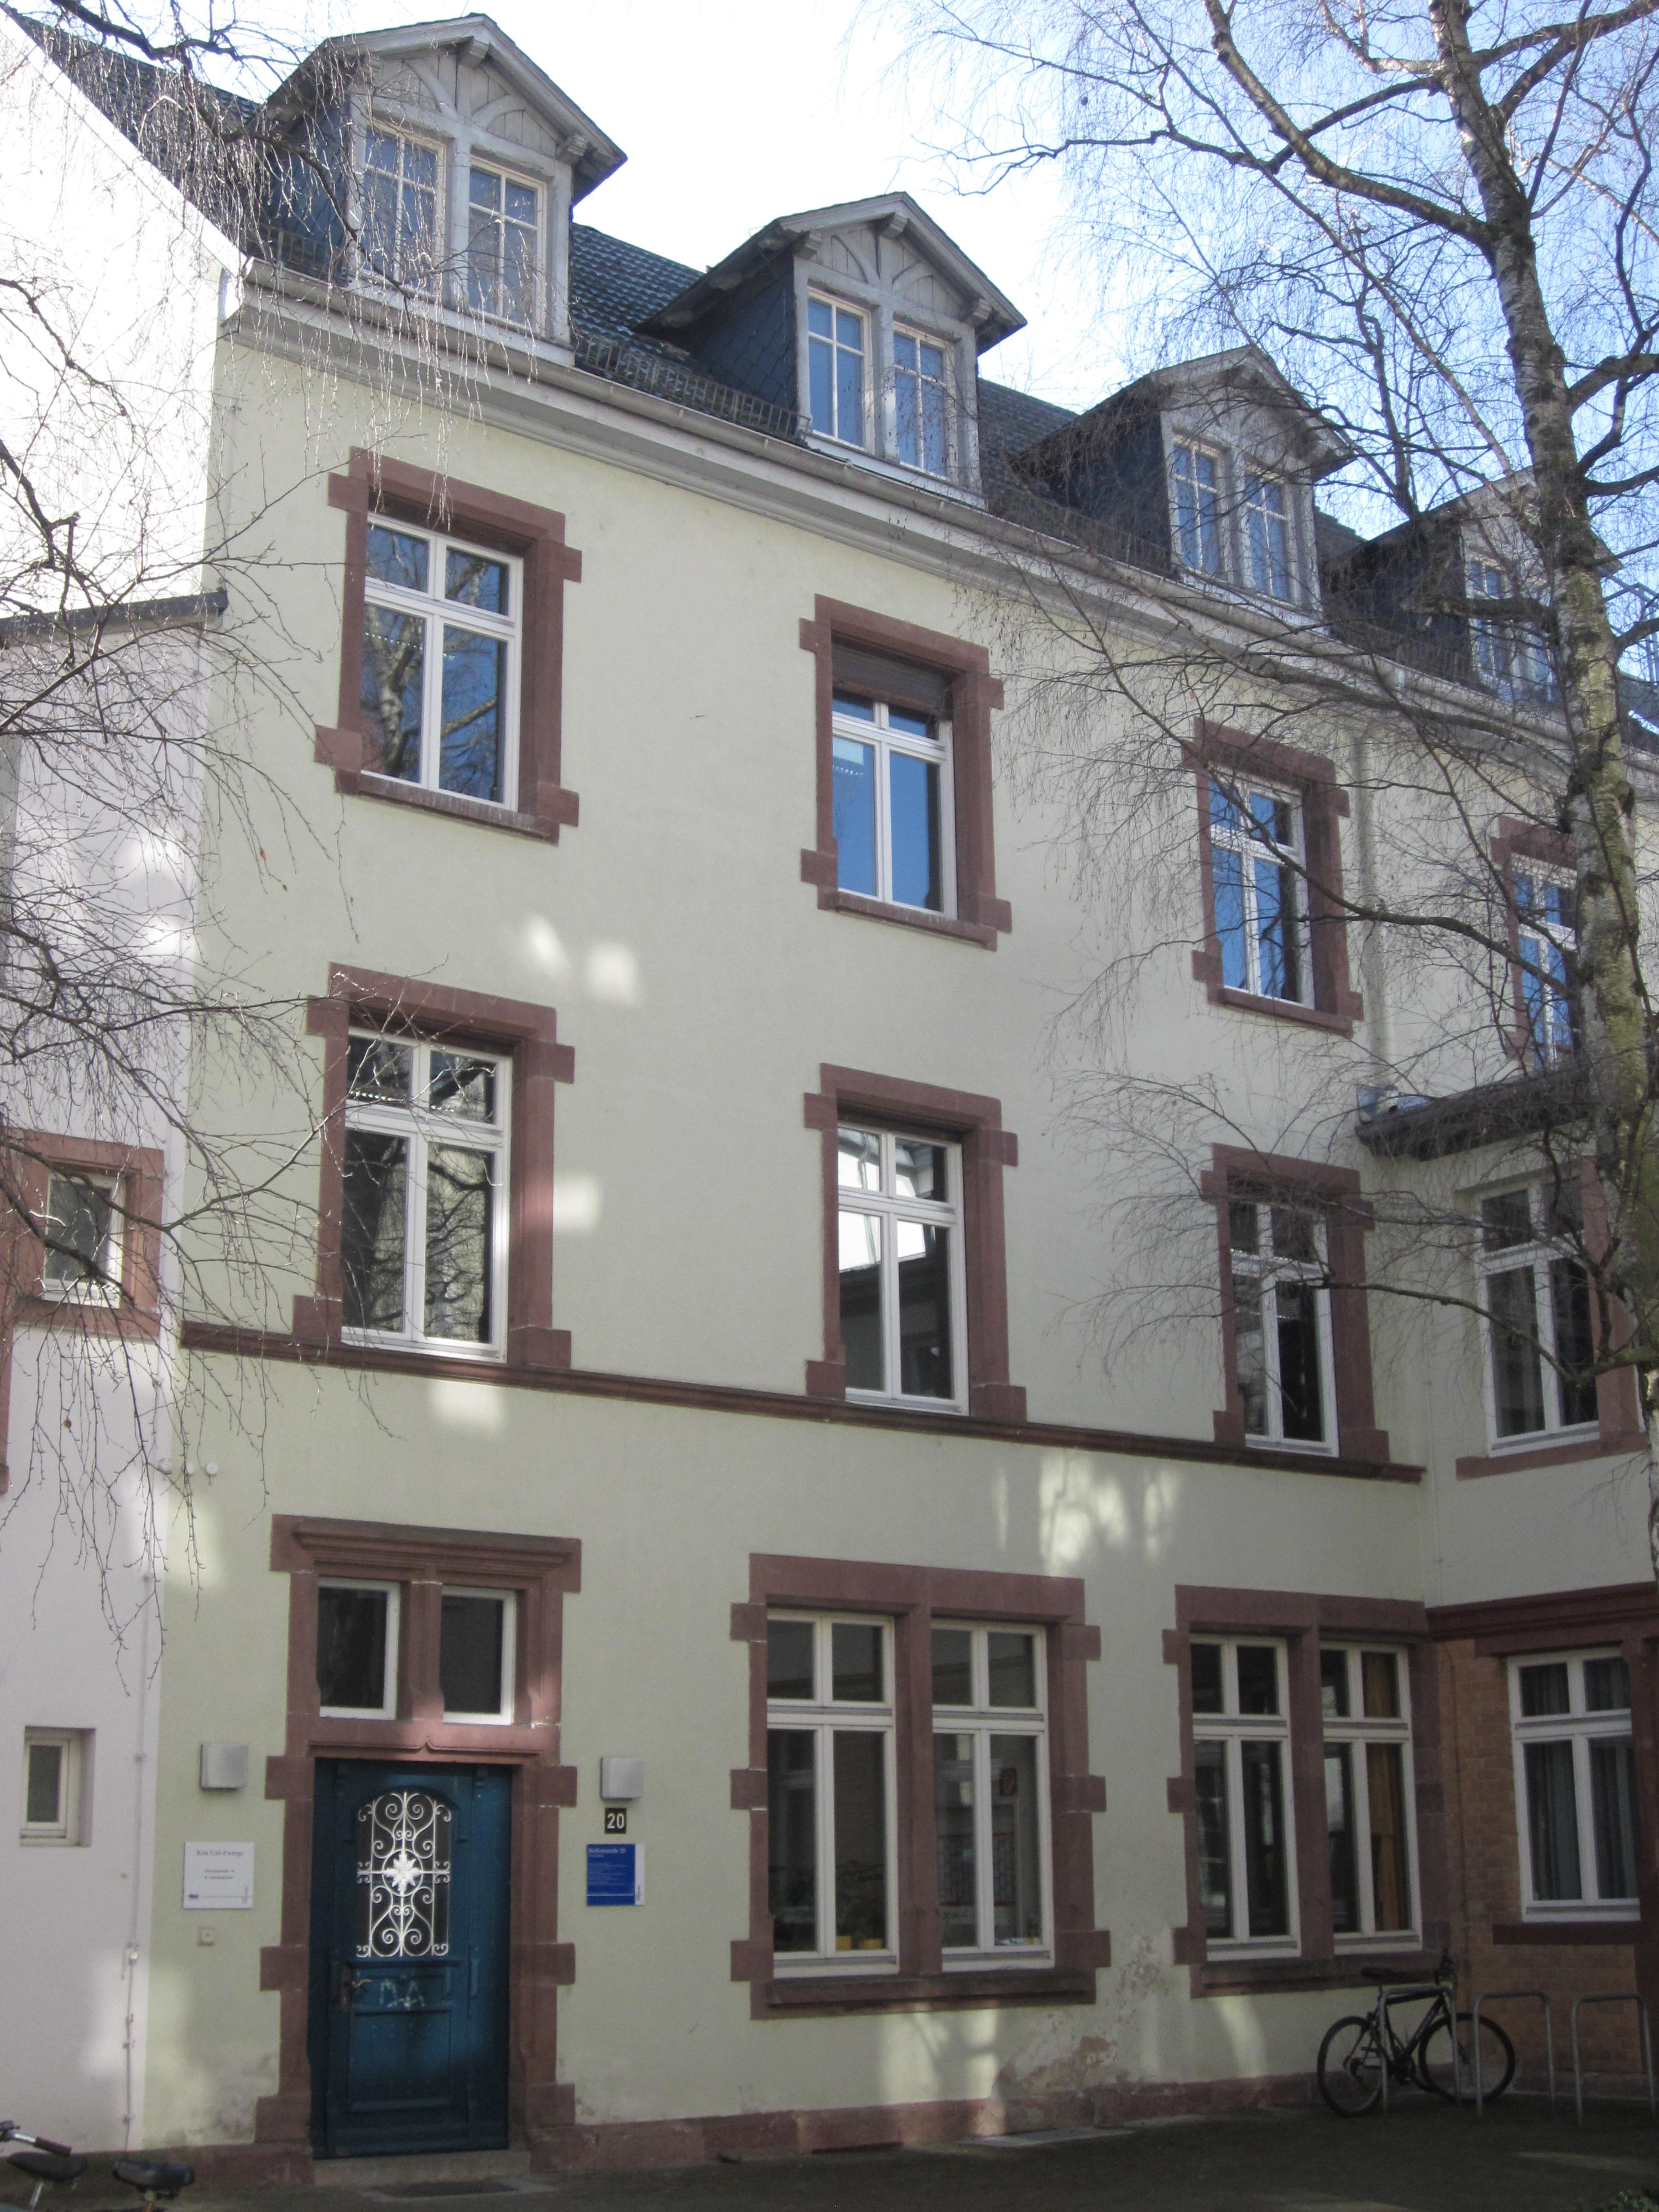 Belfortstraße 20